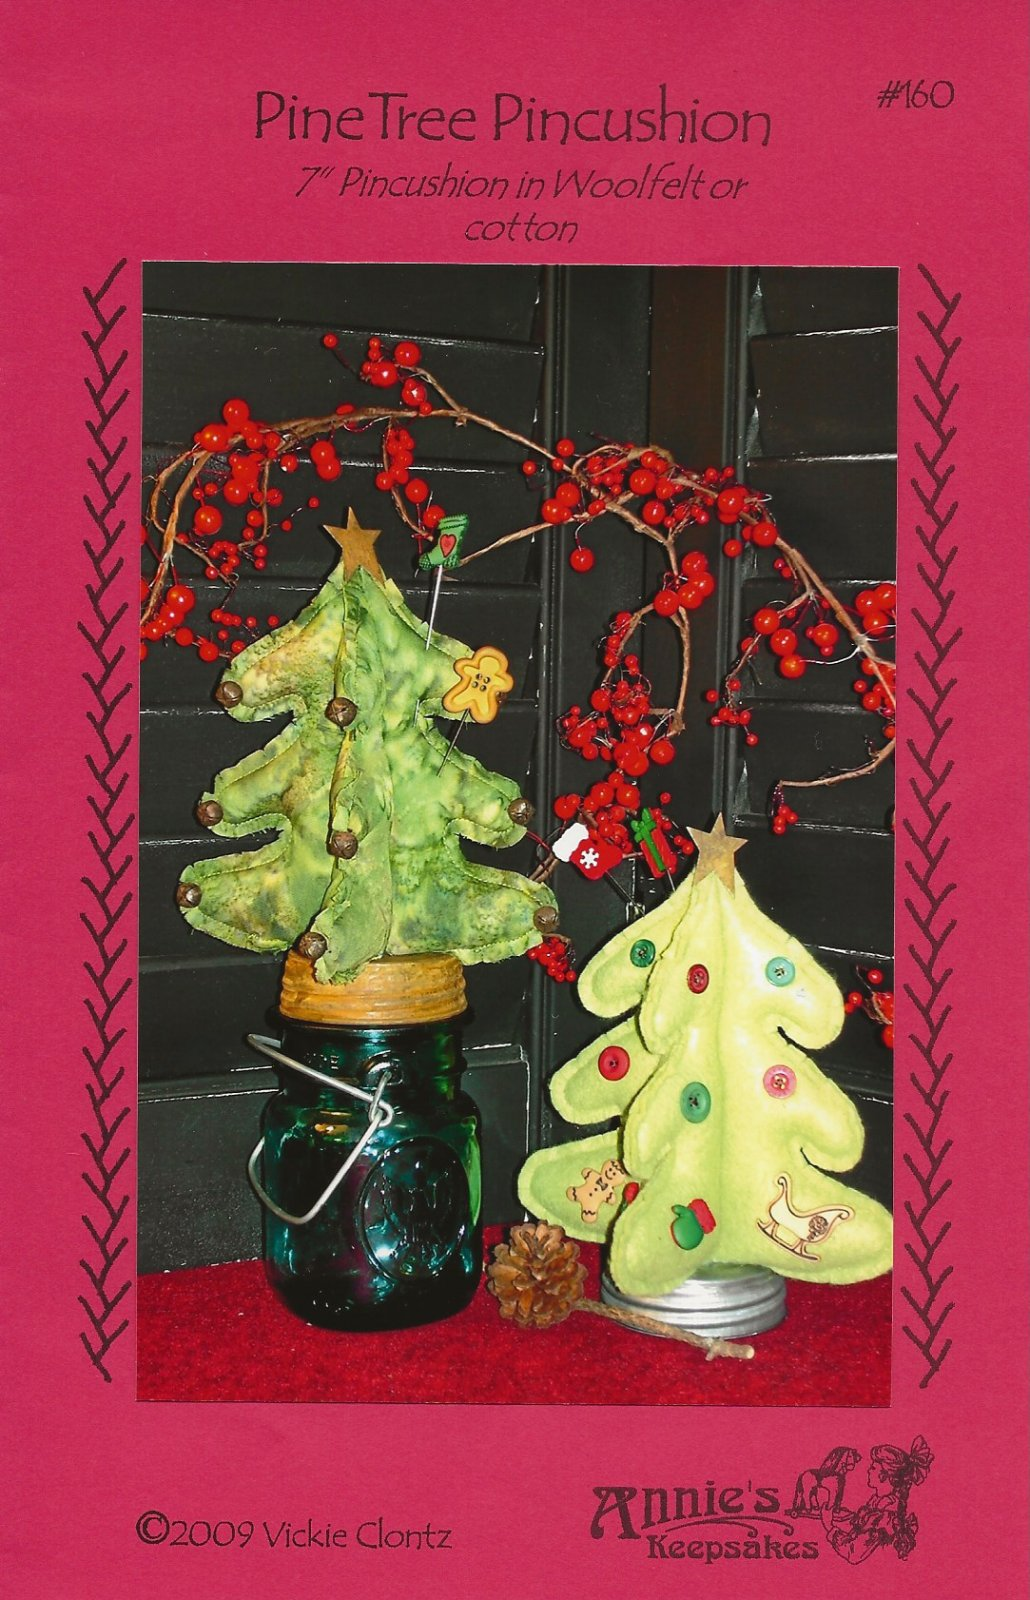 Pine Tree Pincushion